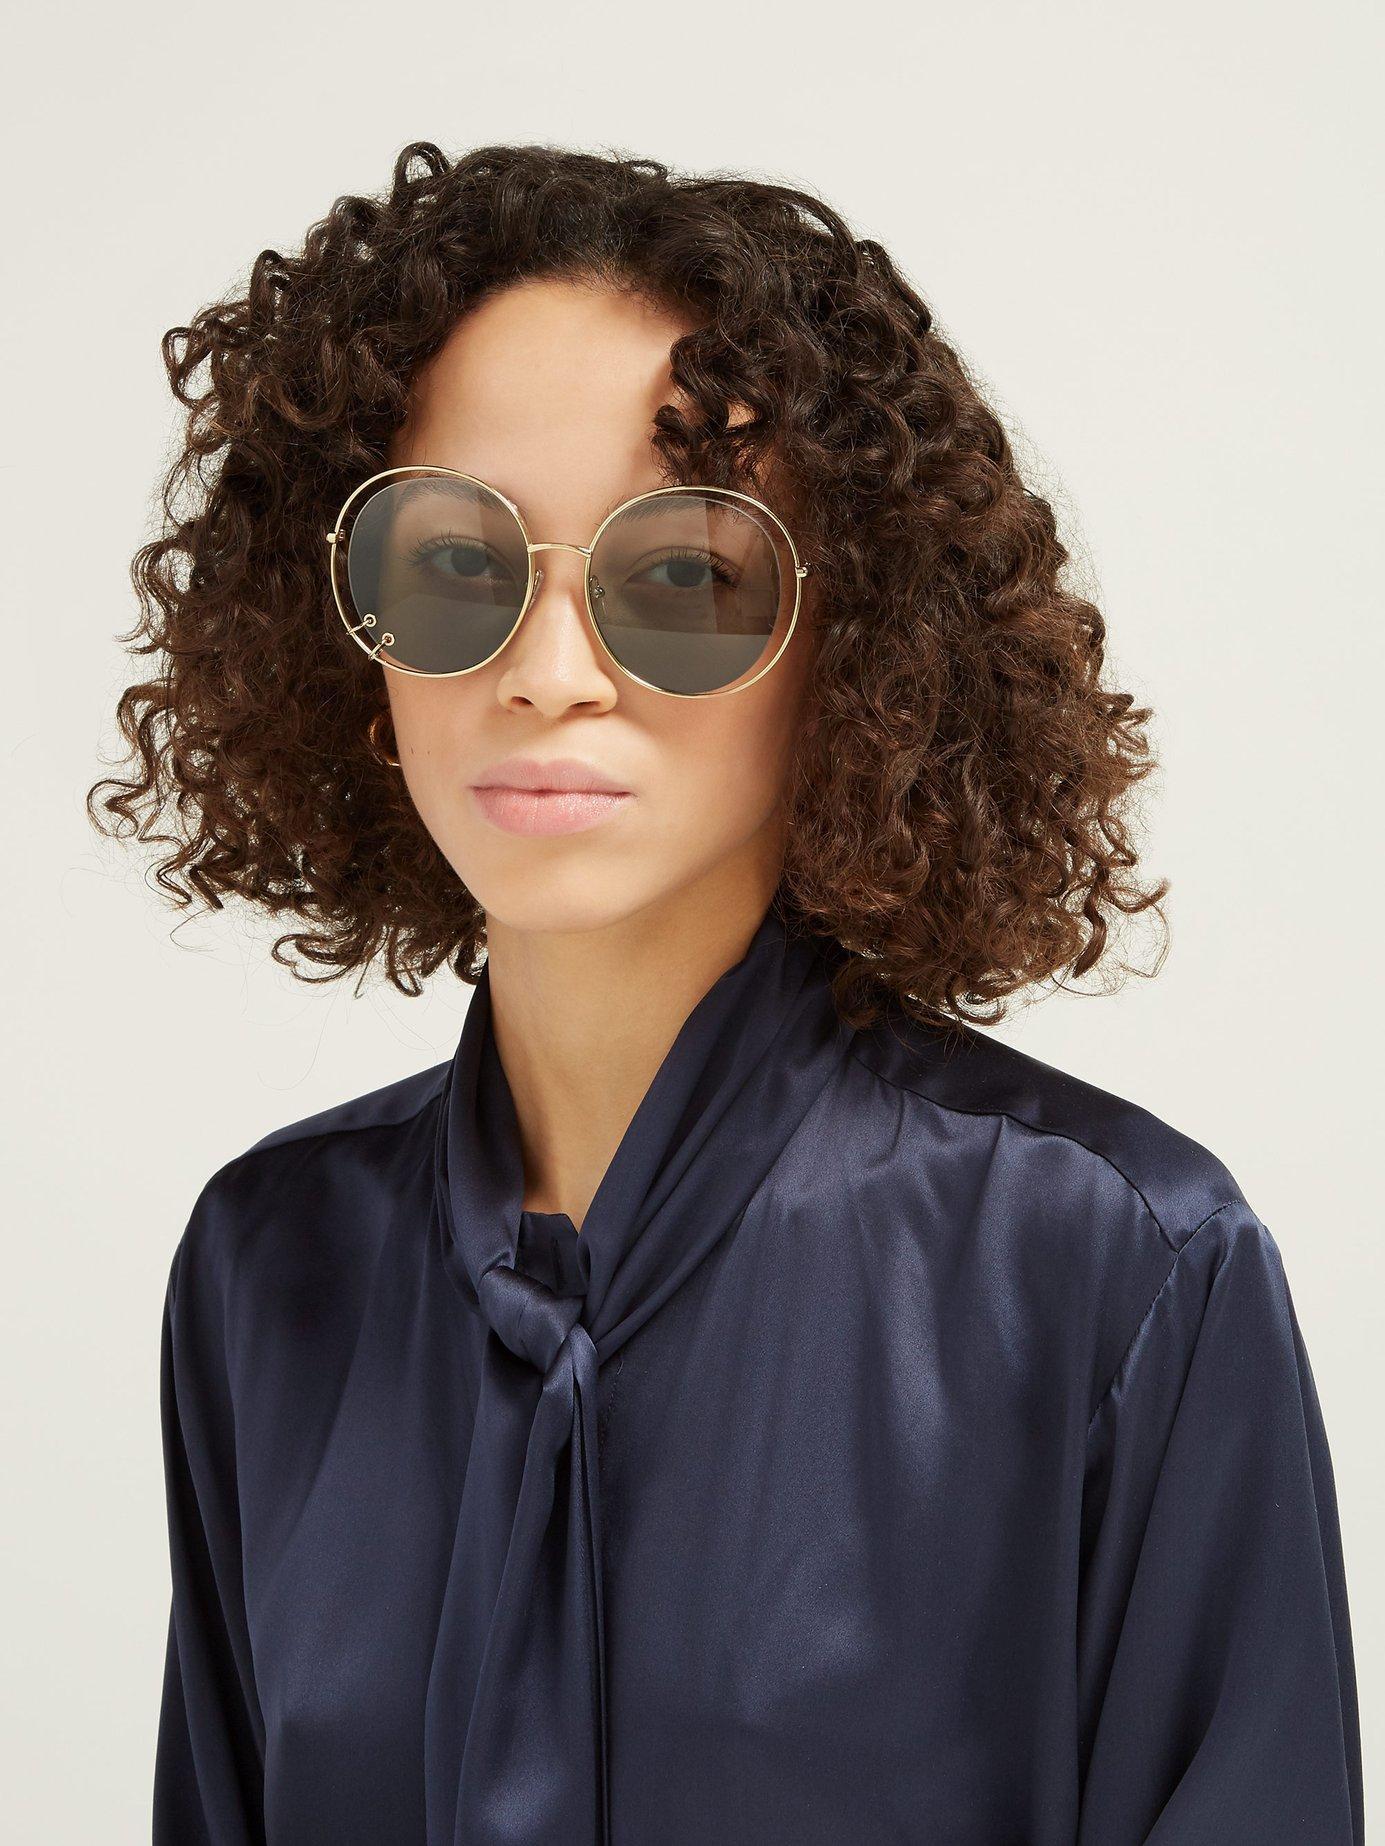 376a8236c12 ... Carlina Oversized Round Sunglasses - Lyst. View fullscreen